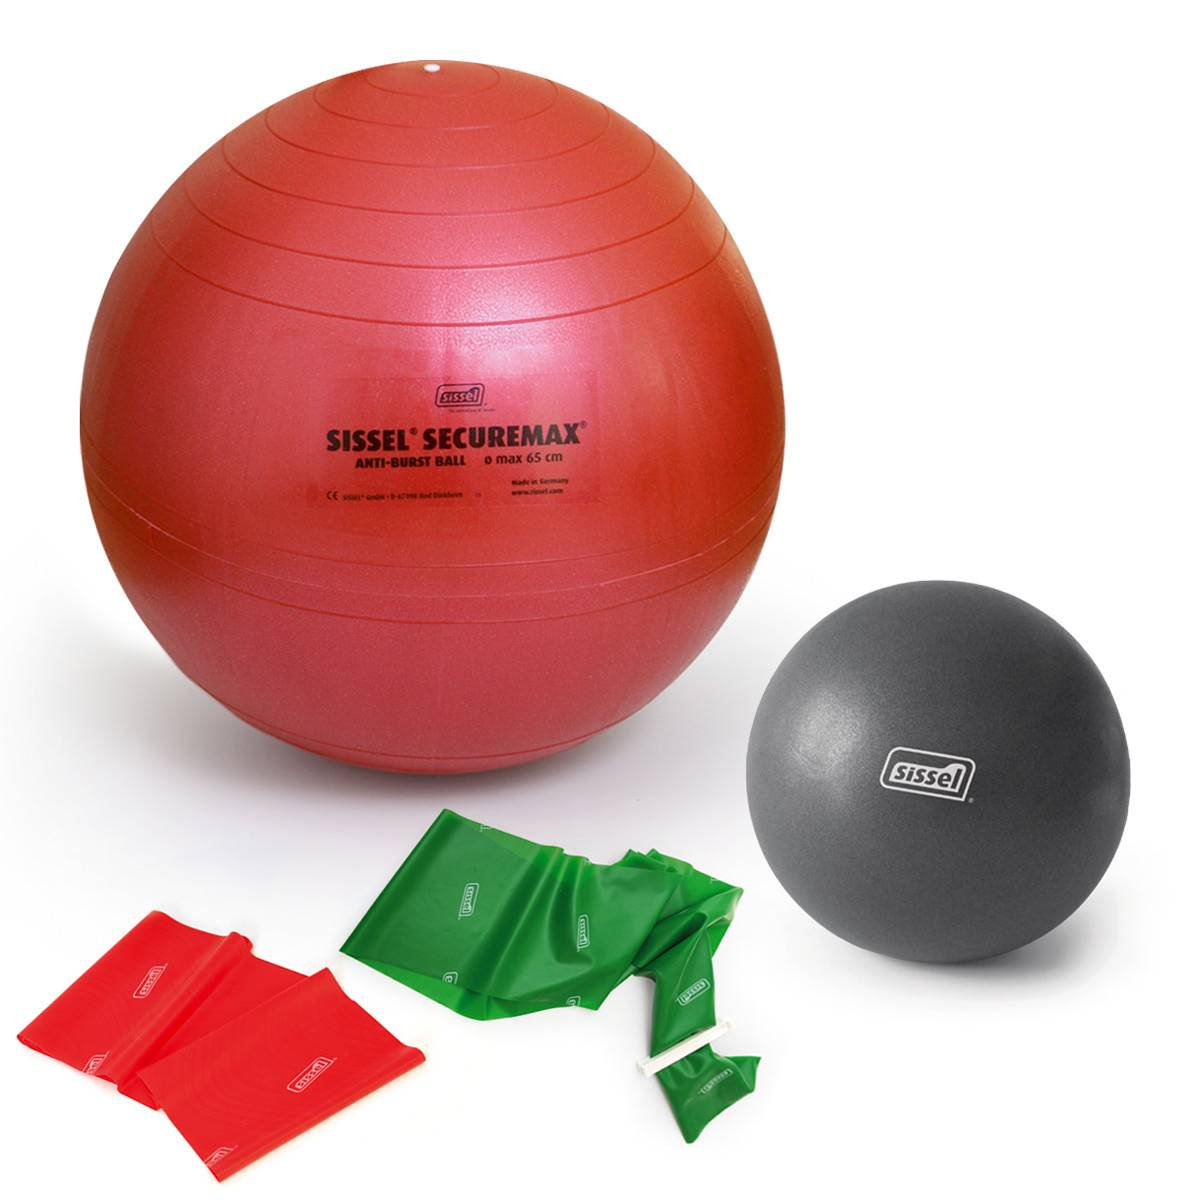 sissel kit pilates con giorgia 3: soft ball - fitball - fitband